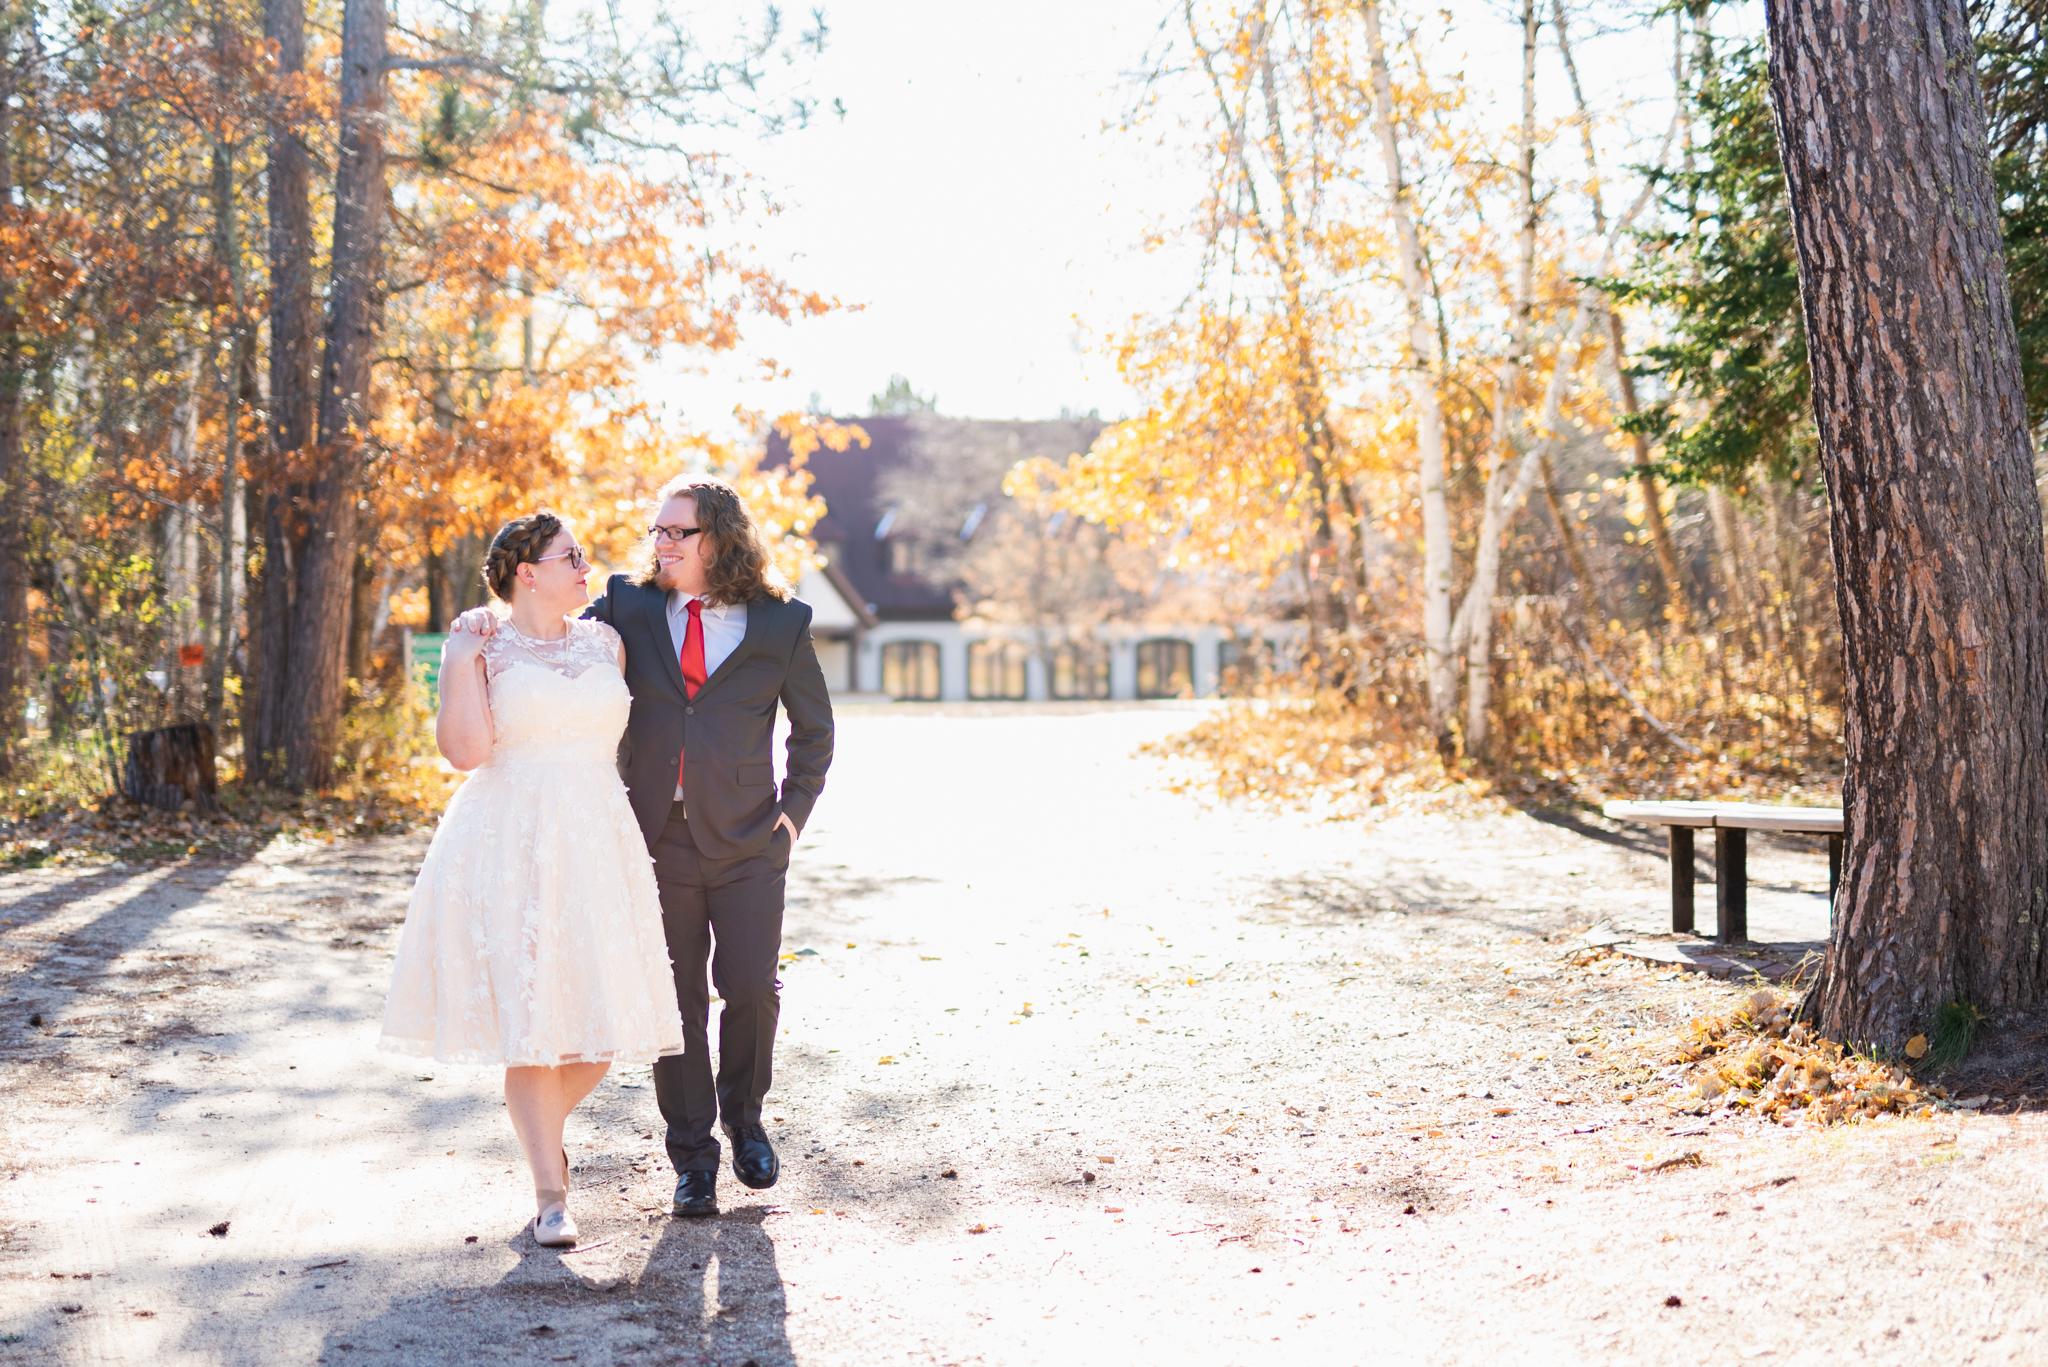 Fall Wedding in Bemidji, MN by Chelsea Joy Photography, Fargo ND Wedding Photographer